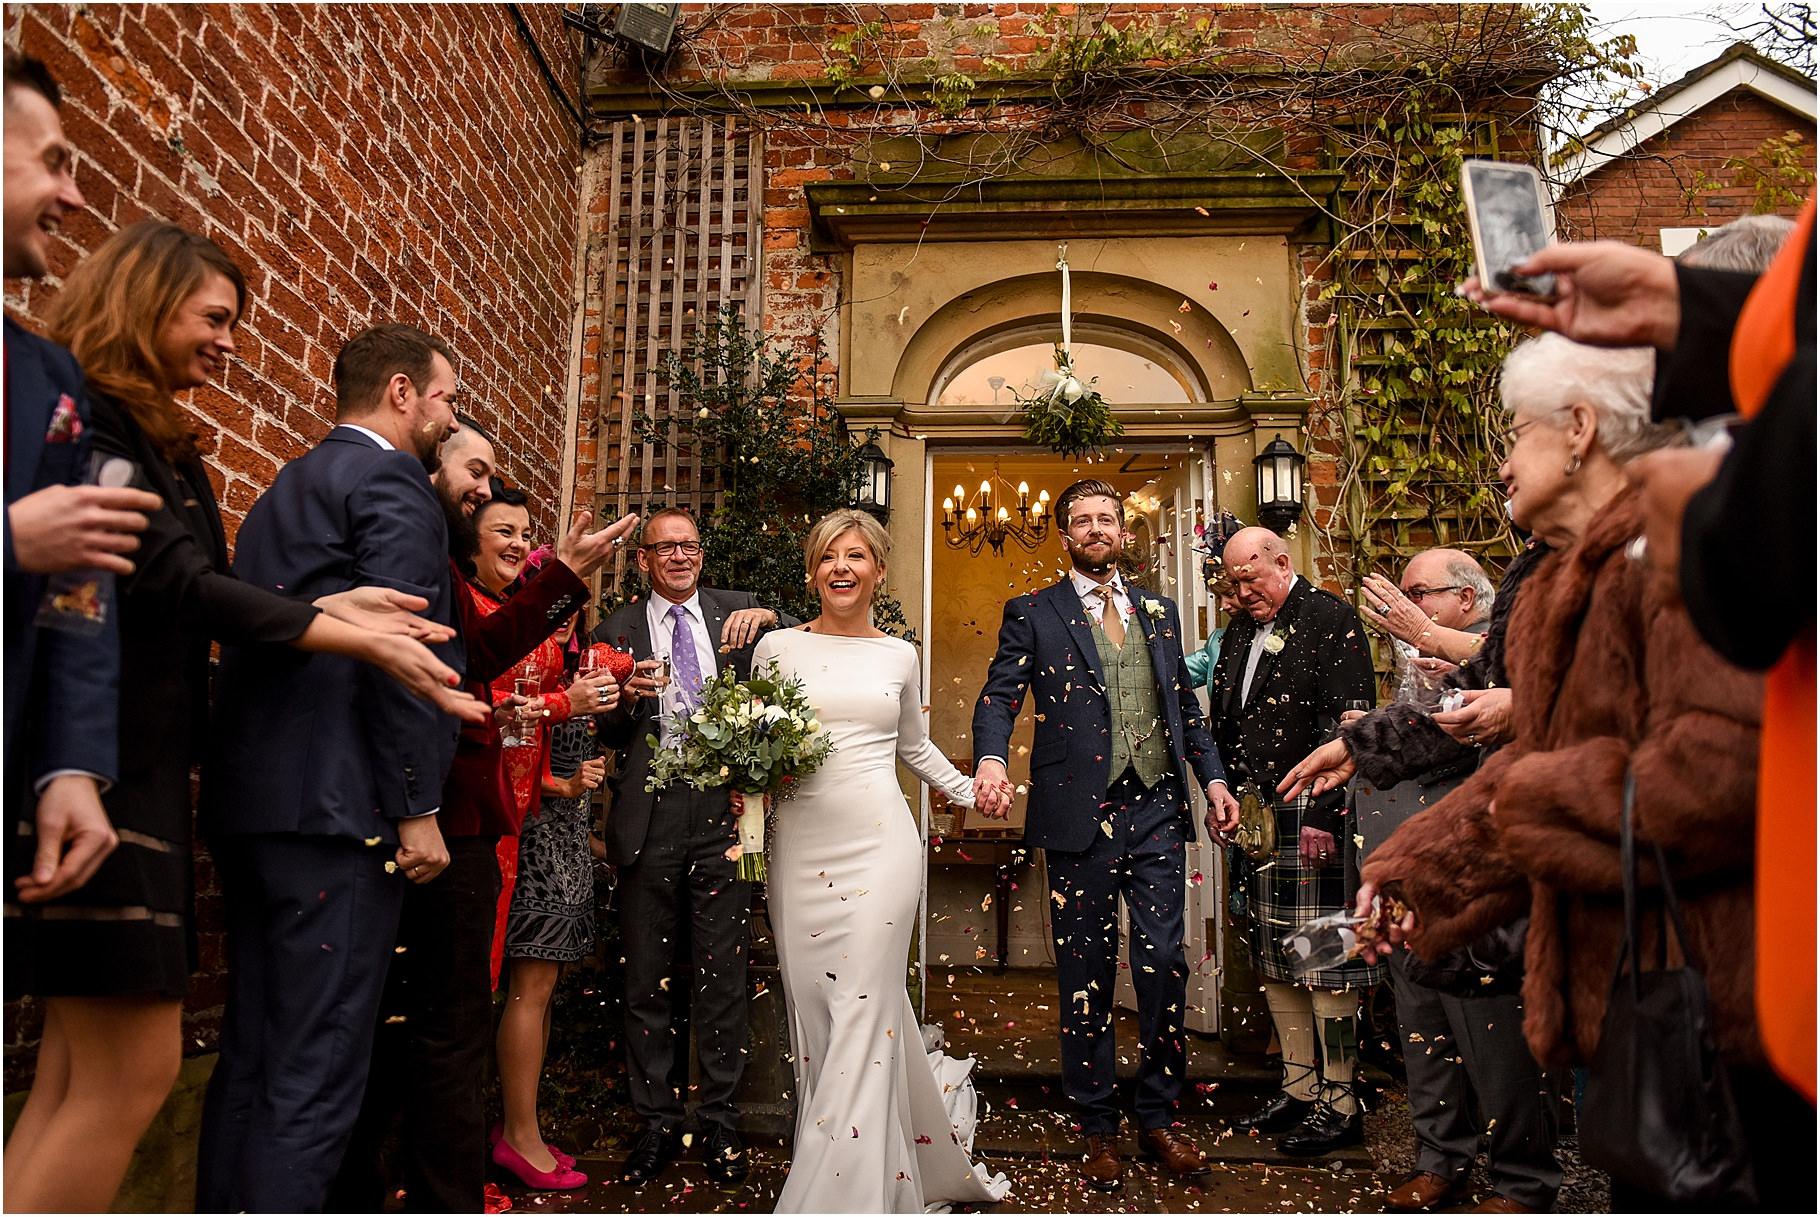 dan-wootton-photography-2017-weddings-117.jpg